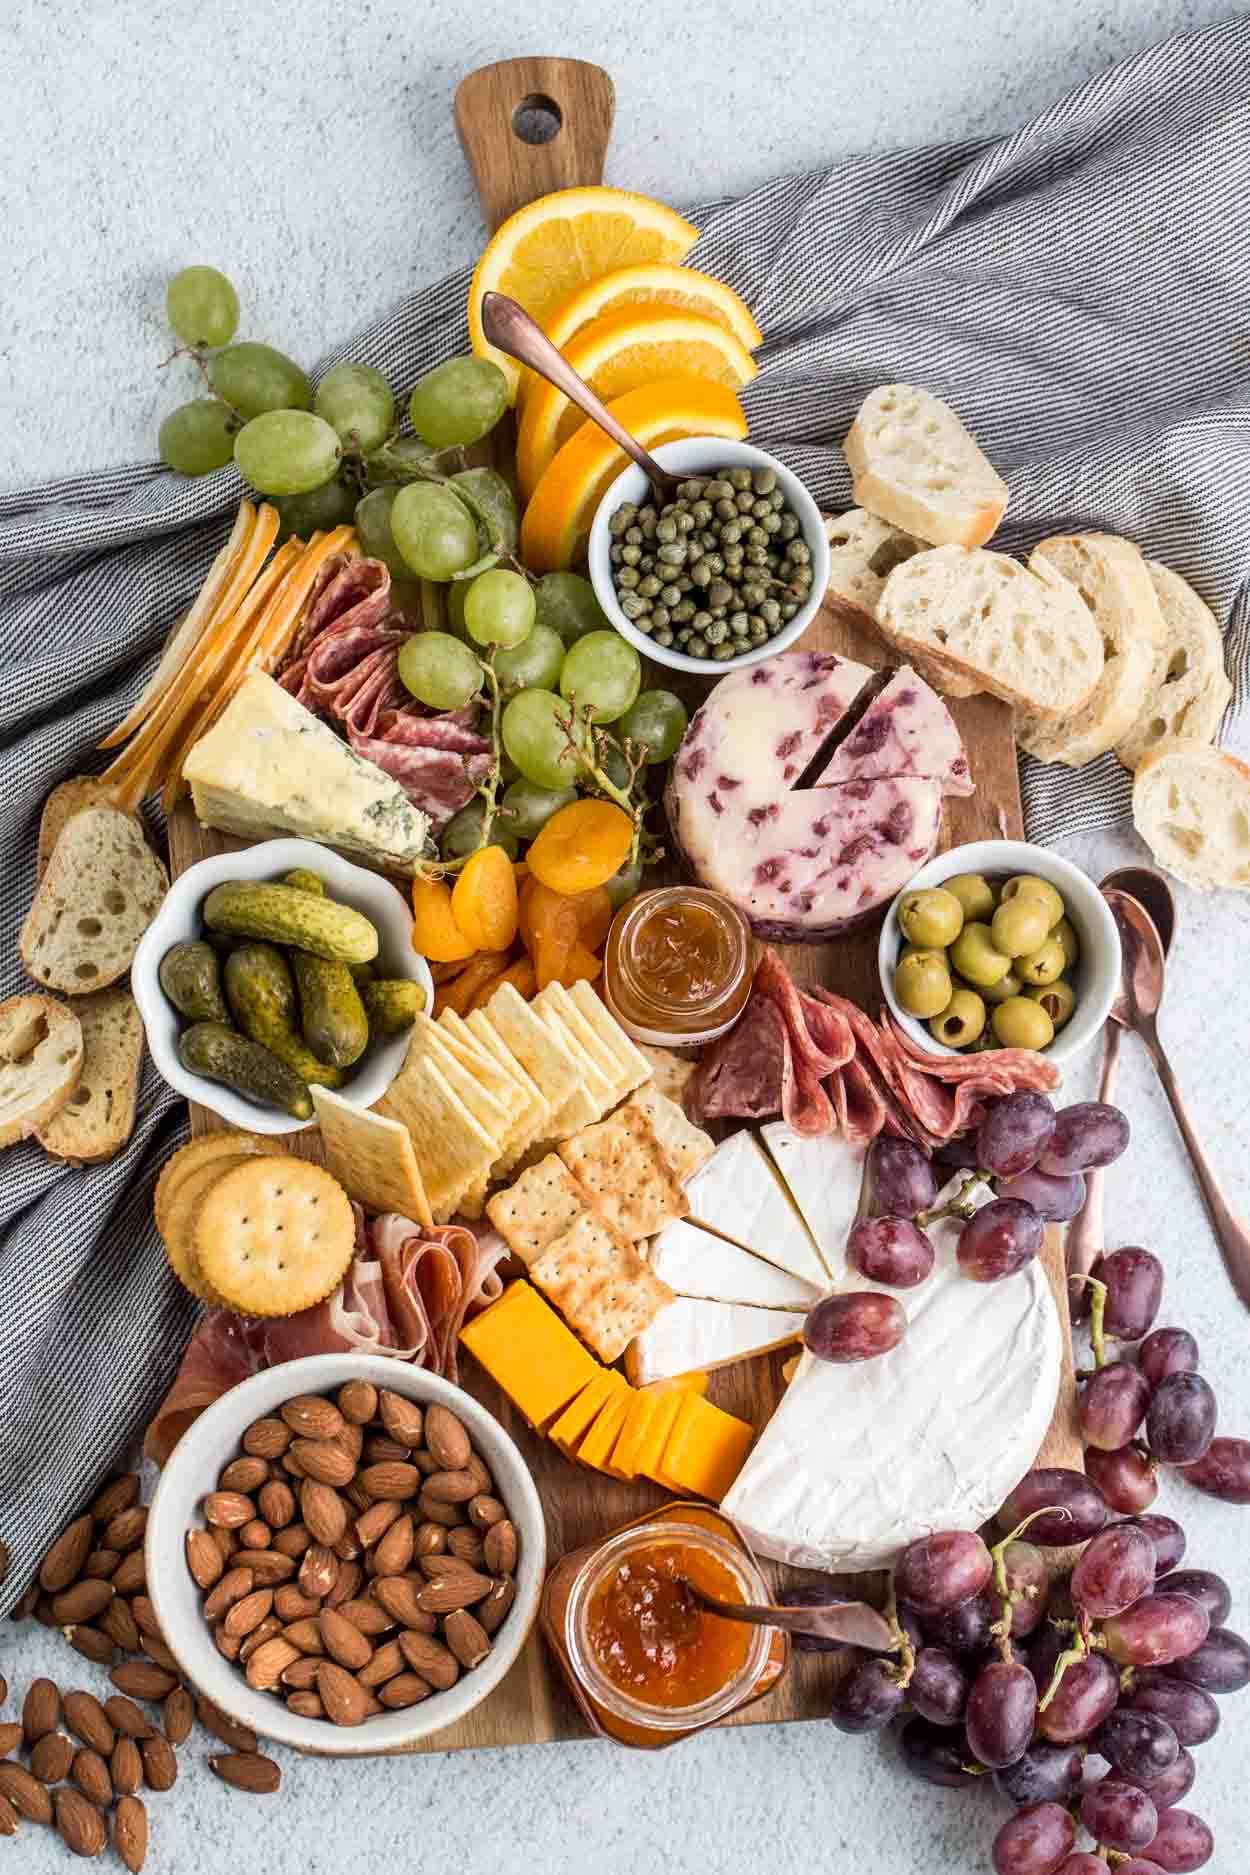 How To Make A Charcuterie Board Cheese Board Valentina S Corner